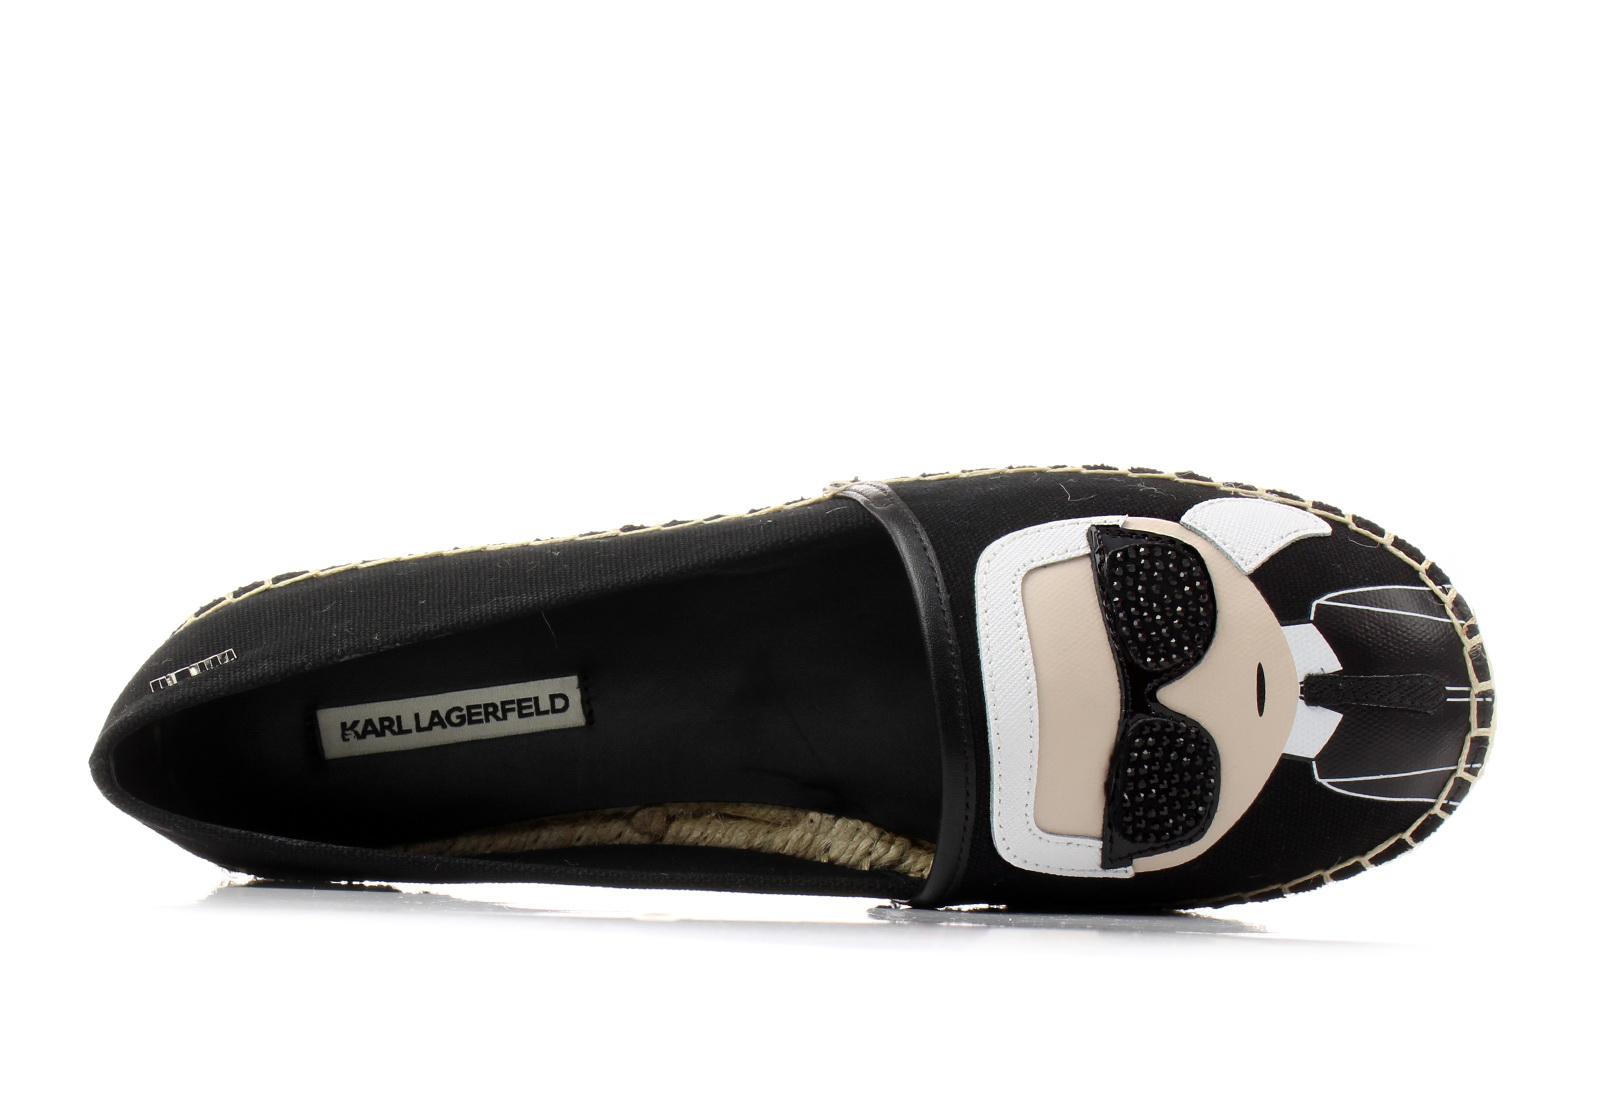 47cdc23a4d Karl Lagerfeld Shoes - Kamini Karl Ikonic - KL80111-400 - Online ...